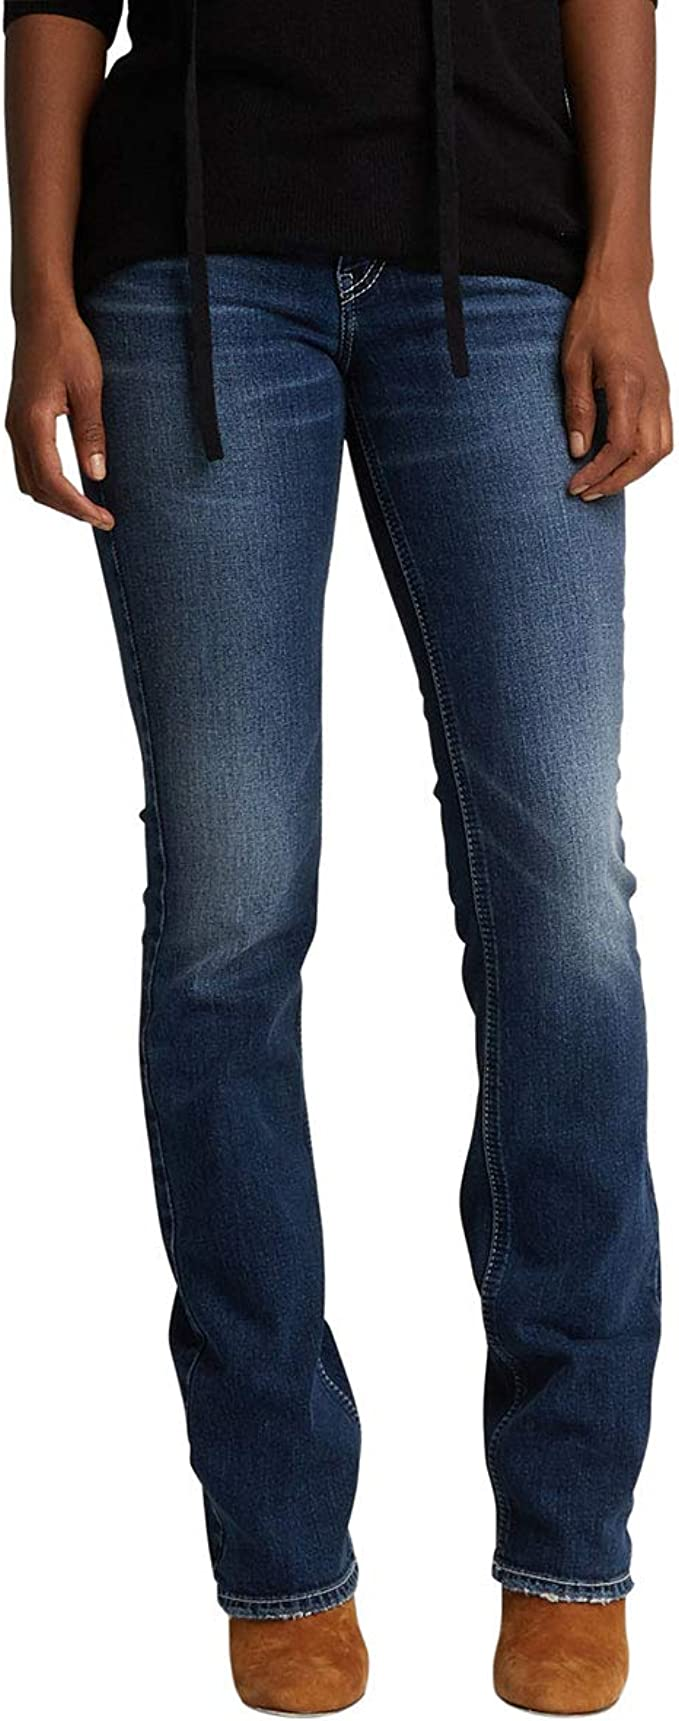 Silver Suki Slim Boot Cut Jeans Distressed Flap Pocket Plus Size 18 20 22